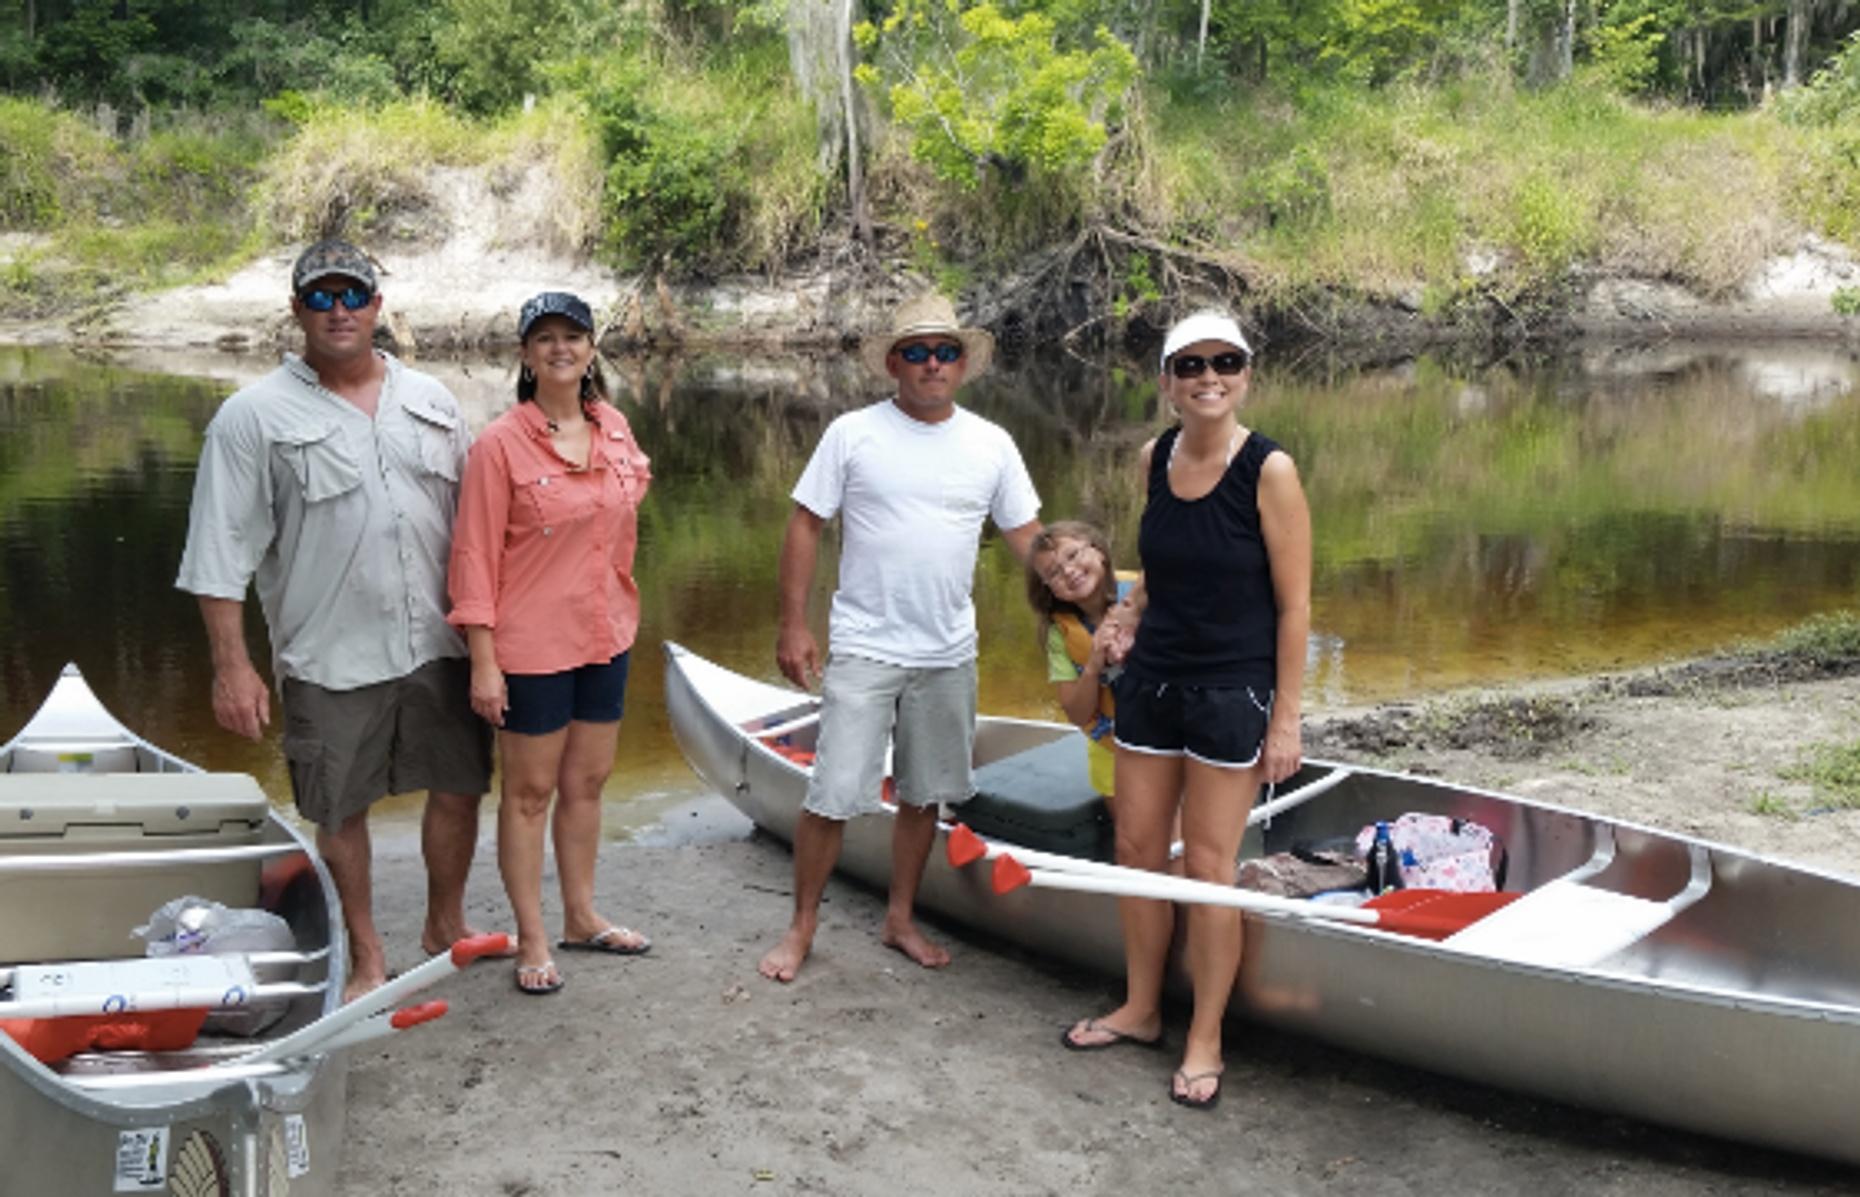 Peace River Water Adventure